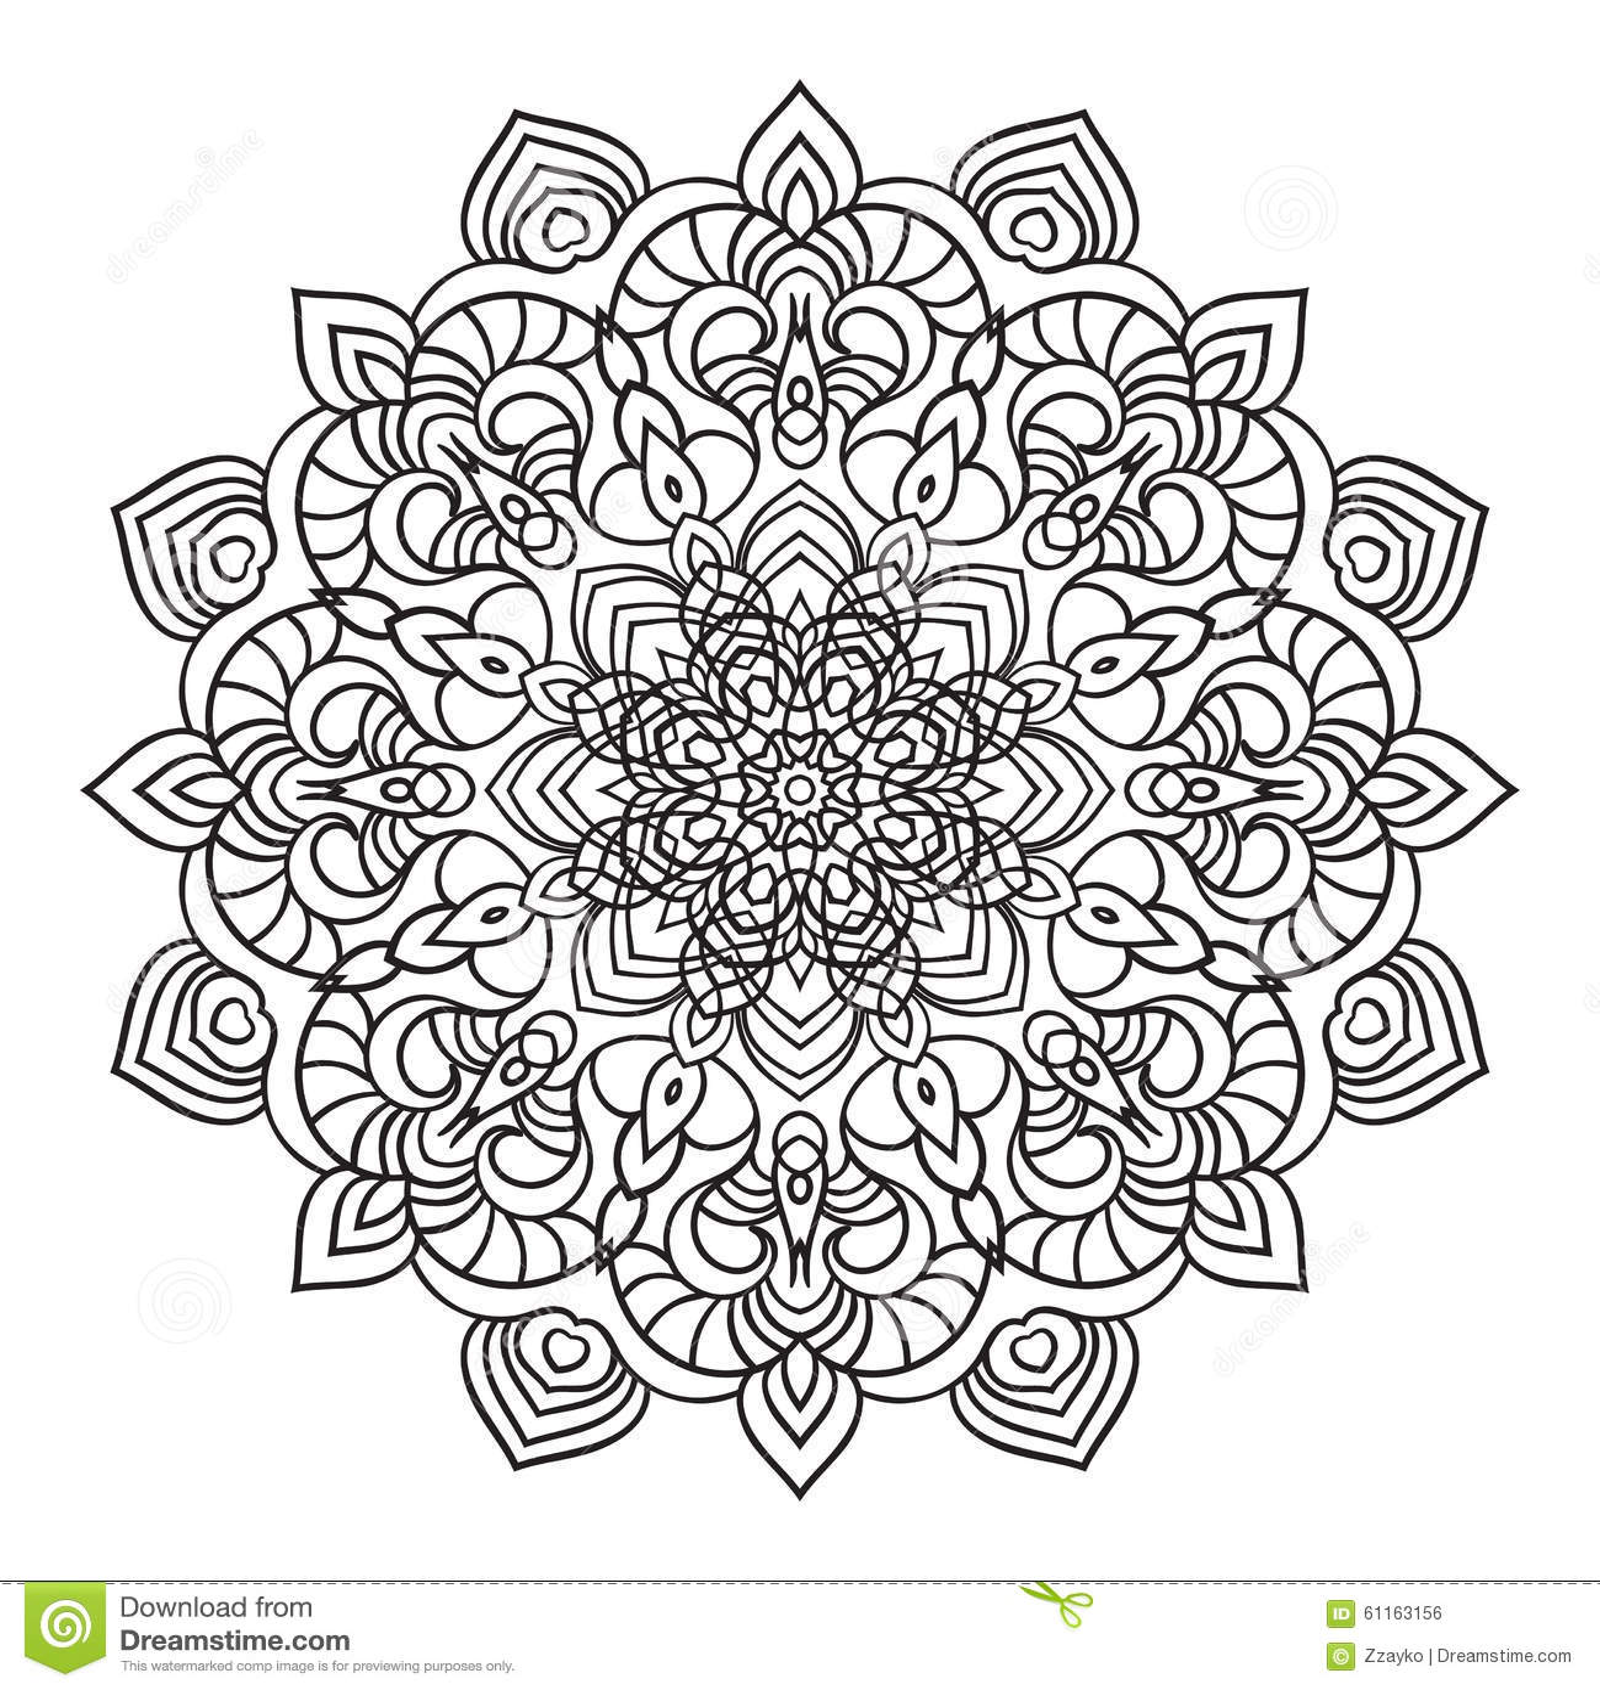 Hand drawing ornate mandala element in eastern style stock illustration image 61163156 - Motif oriental a imprimer ...